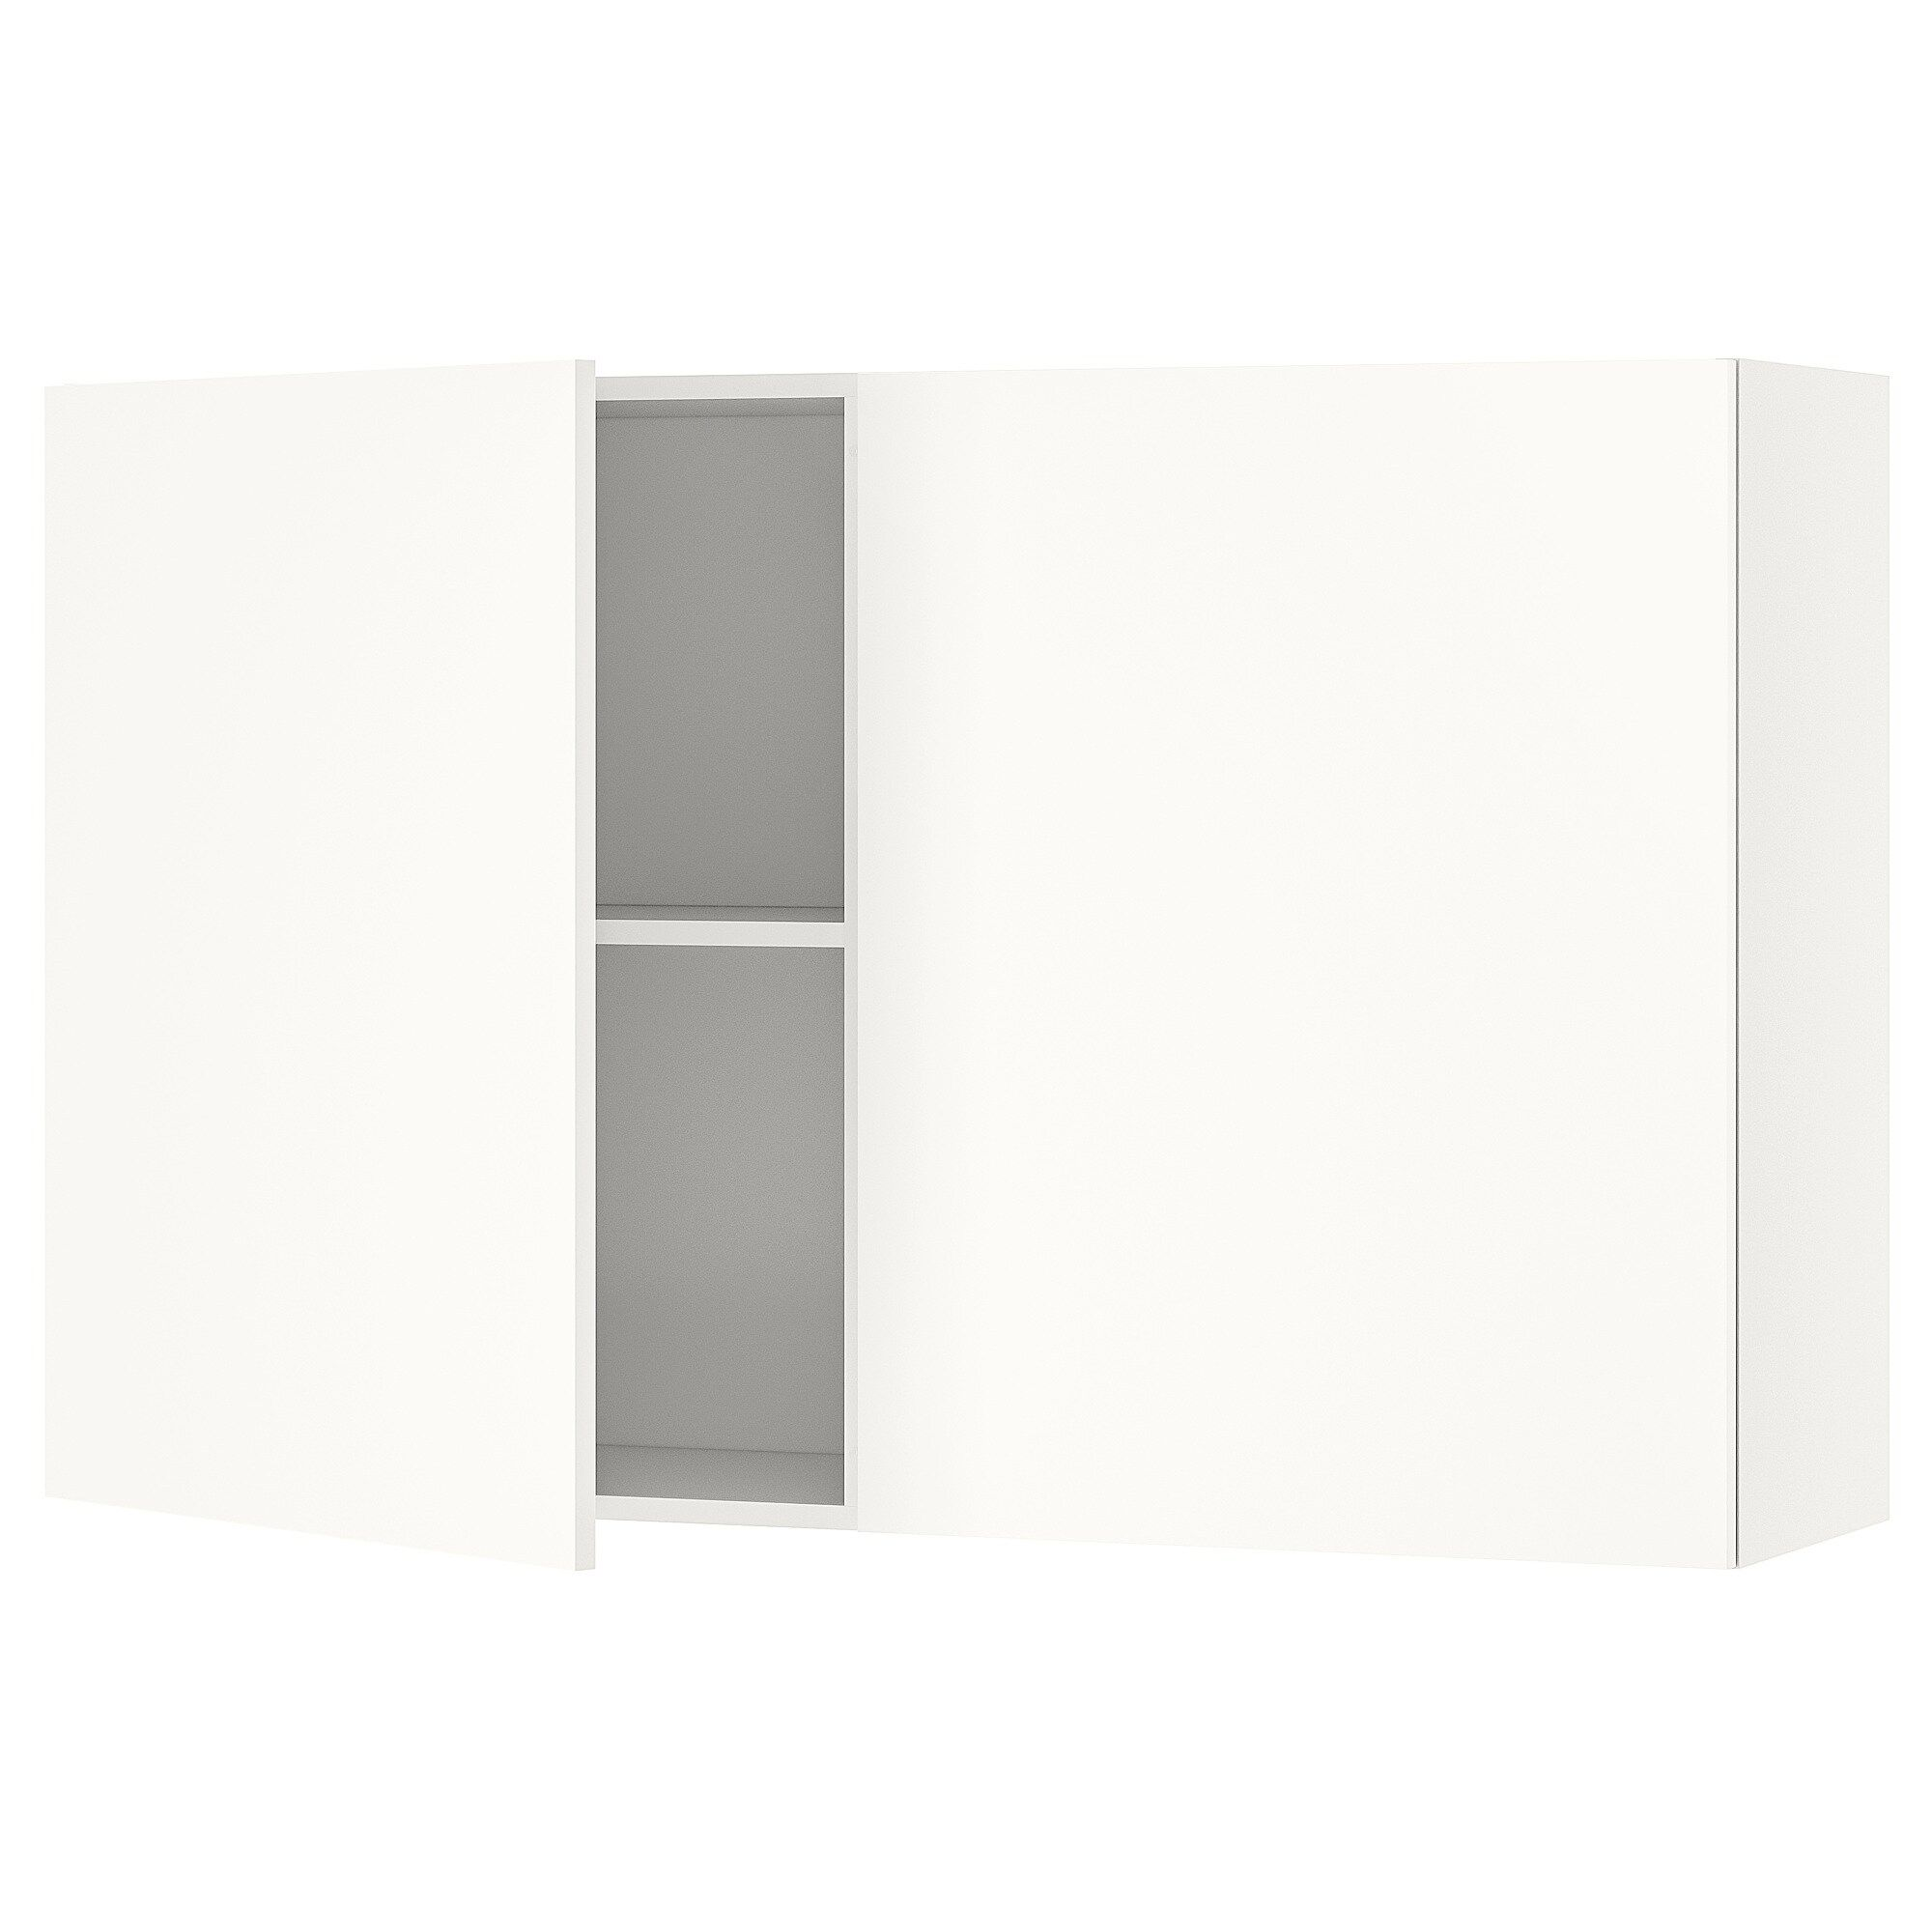 Knoxhult Wandschrank Mit Turen Weiss Ikea Deutschland In 2020 Wandschrank Schrankturen Weisse Turen